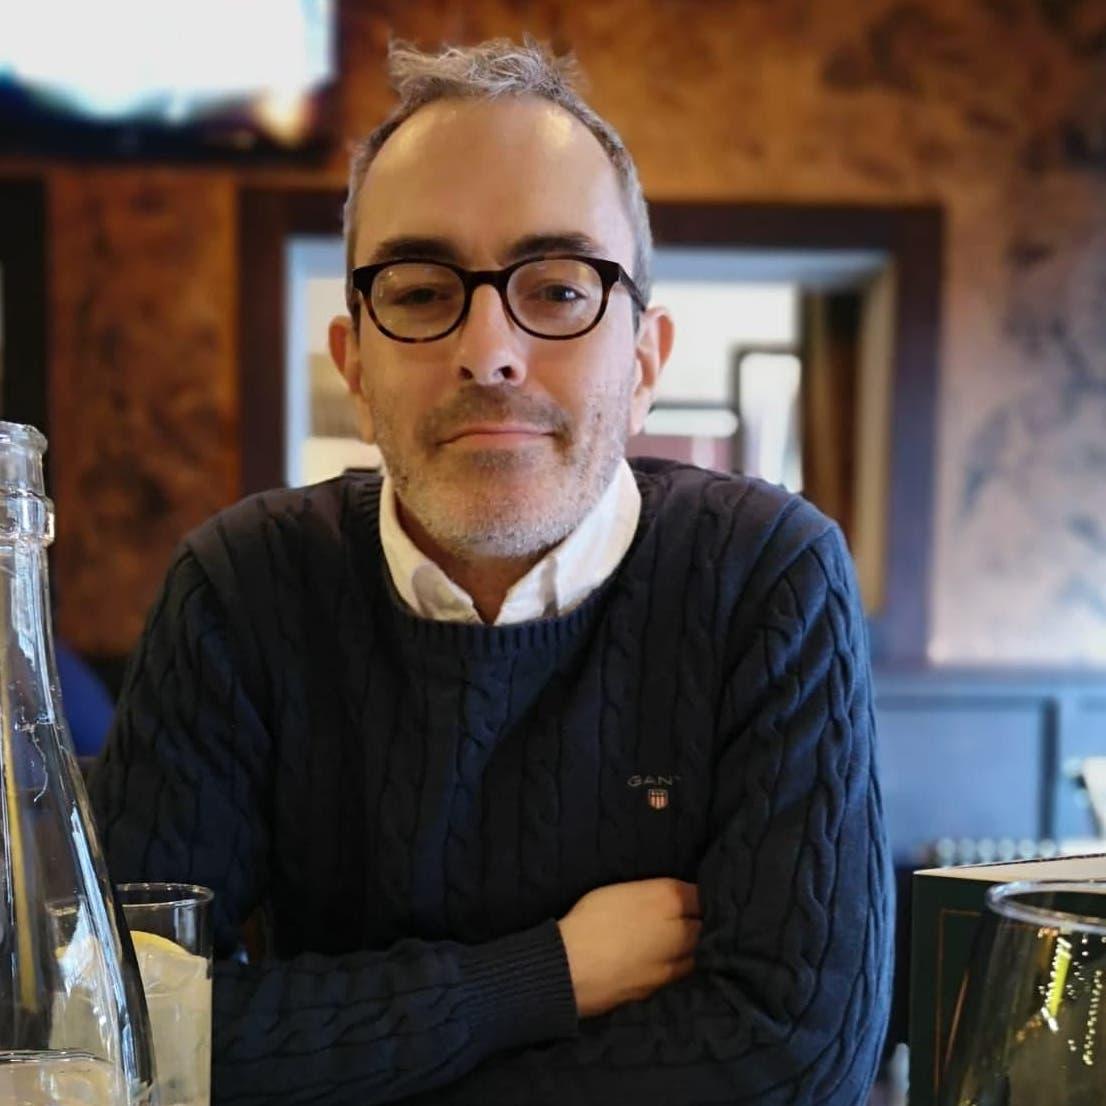 Stewart Lochrie, Mangaing Director of Caledonian LDT